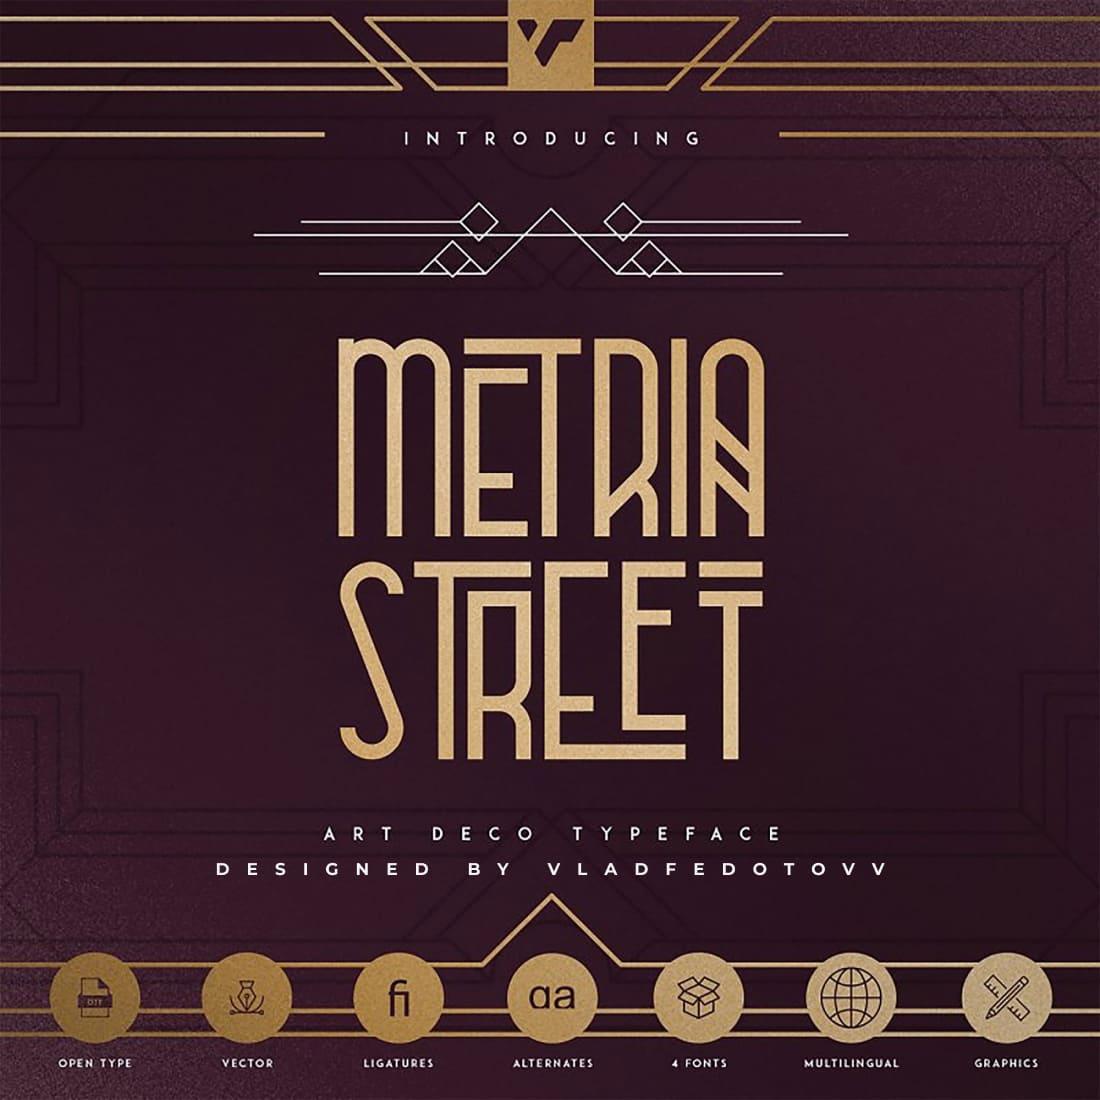 Metria Street – Art Deco Typeface cover image.